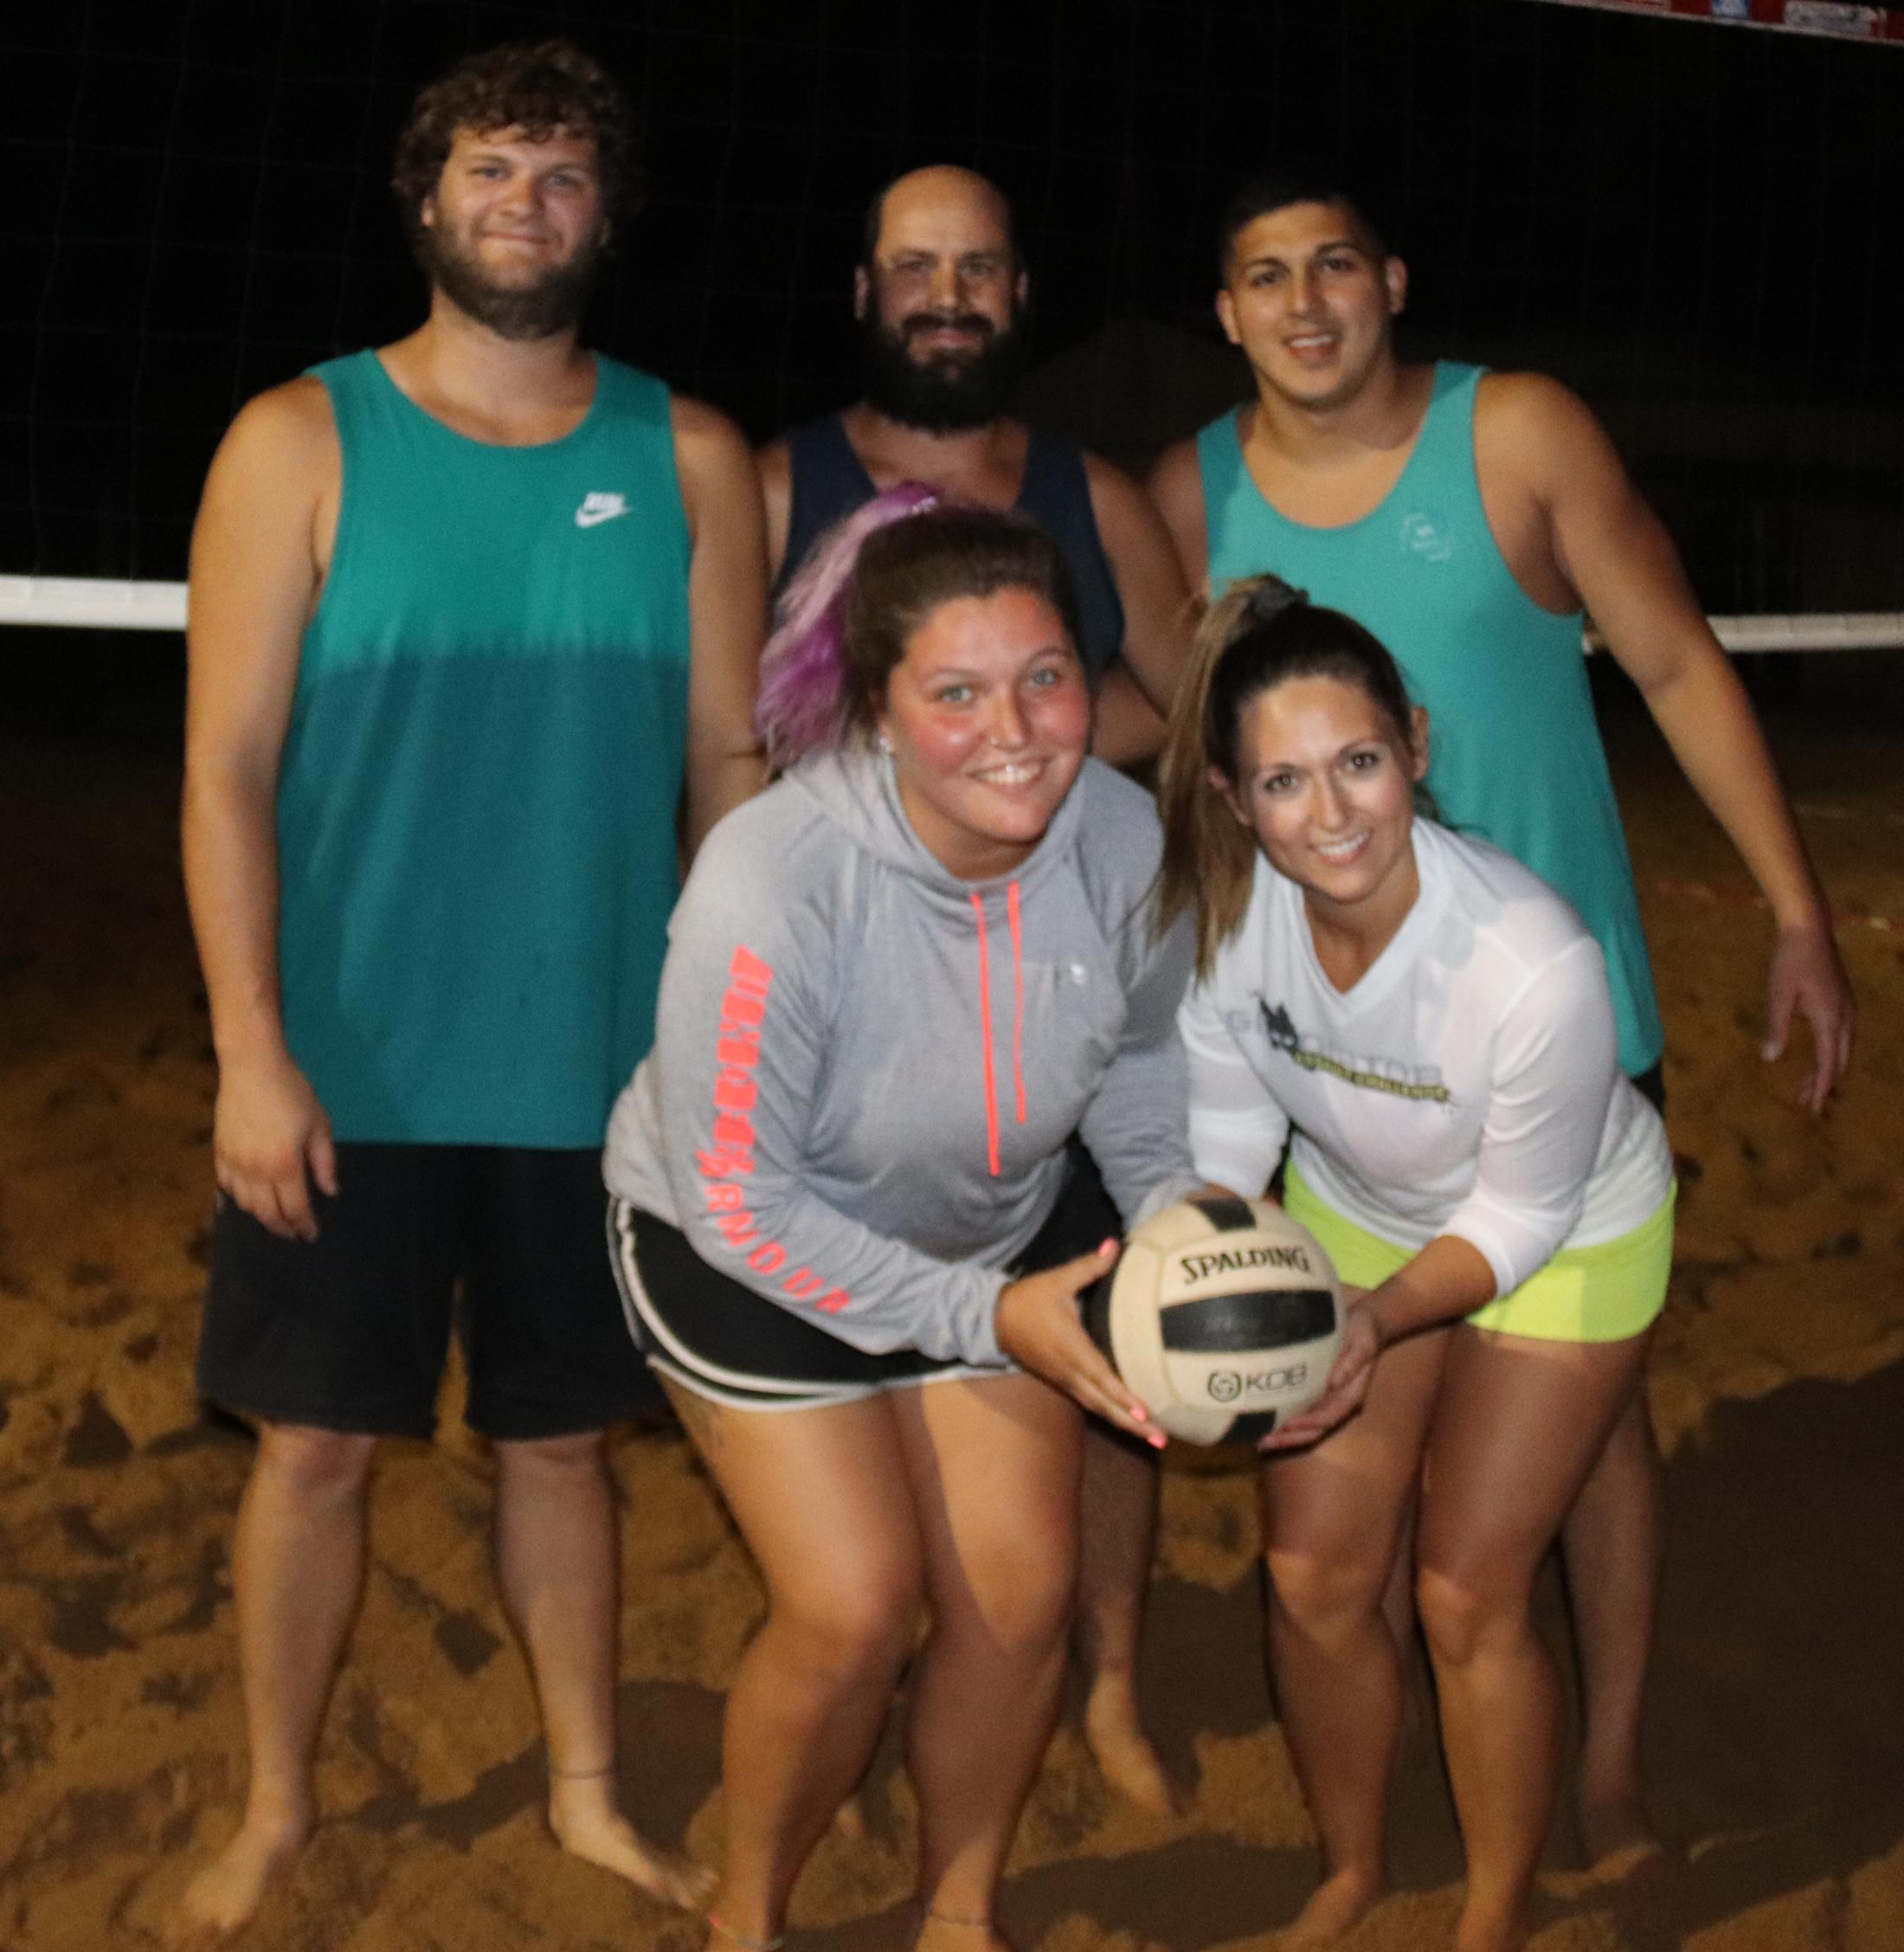 F&AJ's win Comet Bowl Sand Volleyball League championship